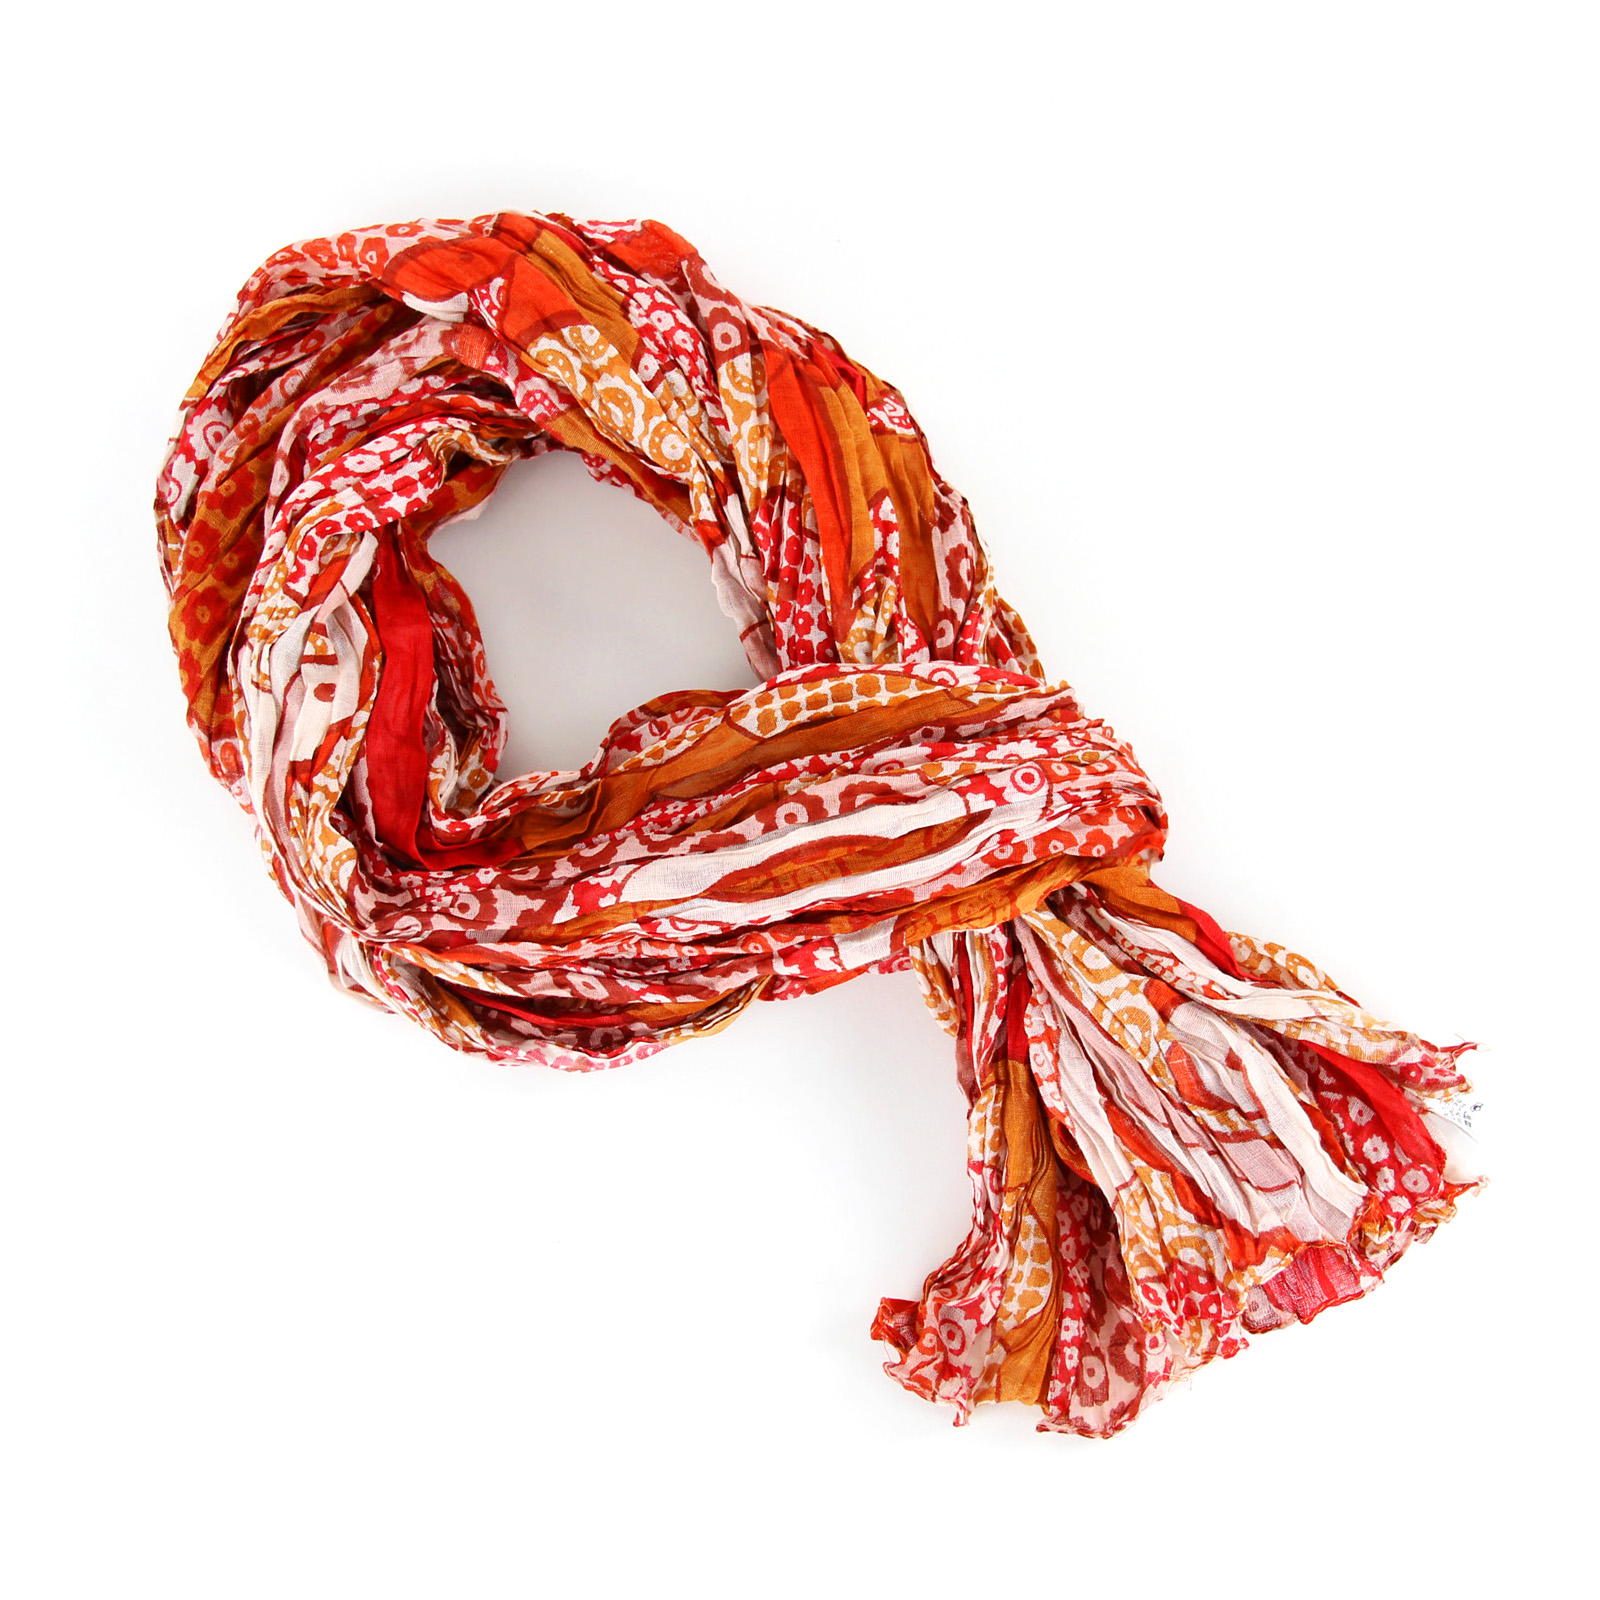 foulard-cheche-coton-orange-rouge-AT-01837--F16